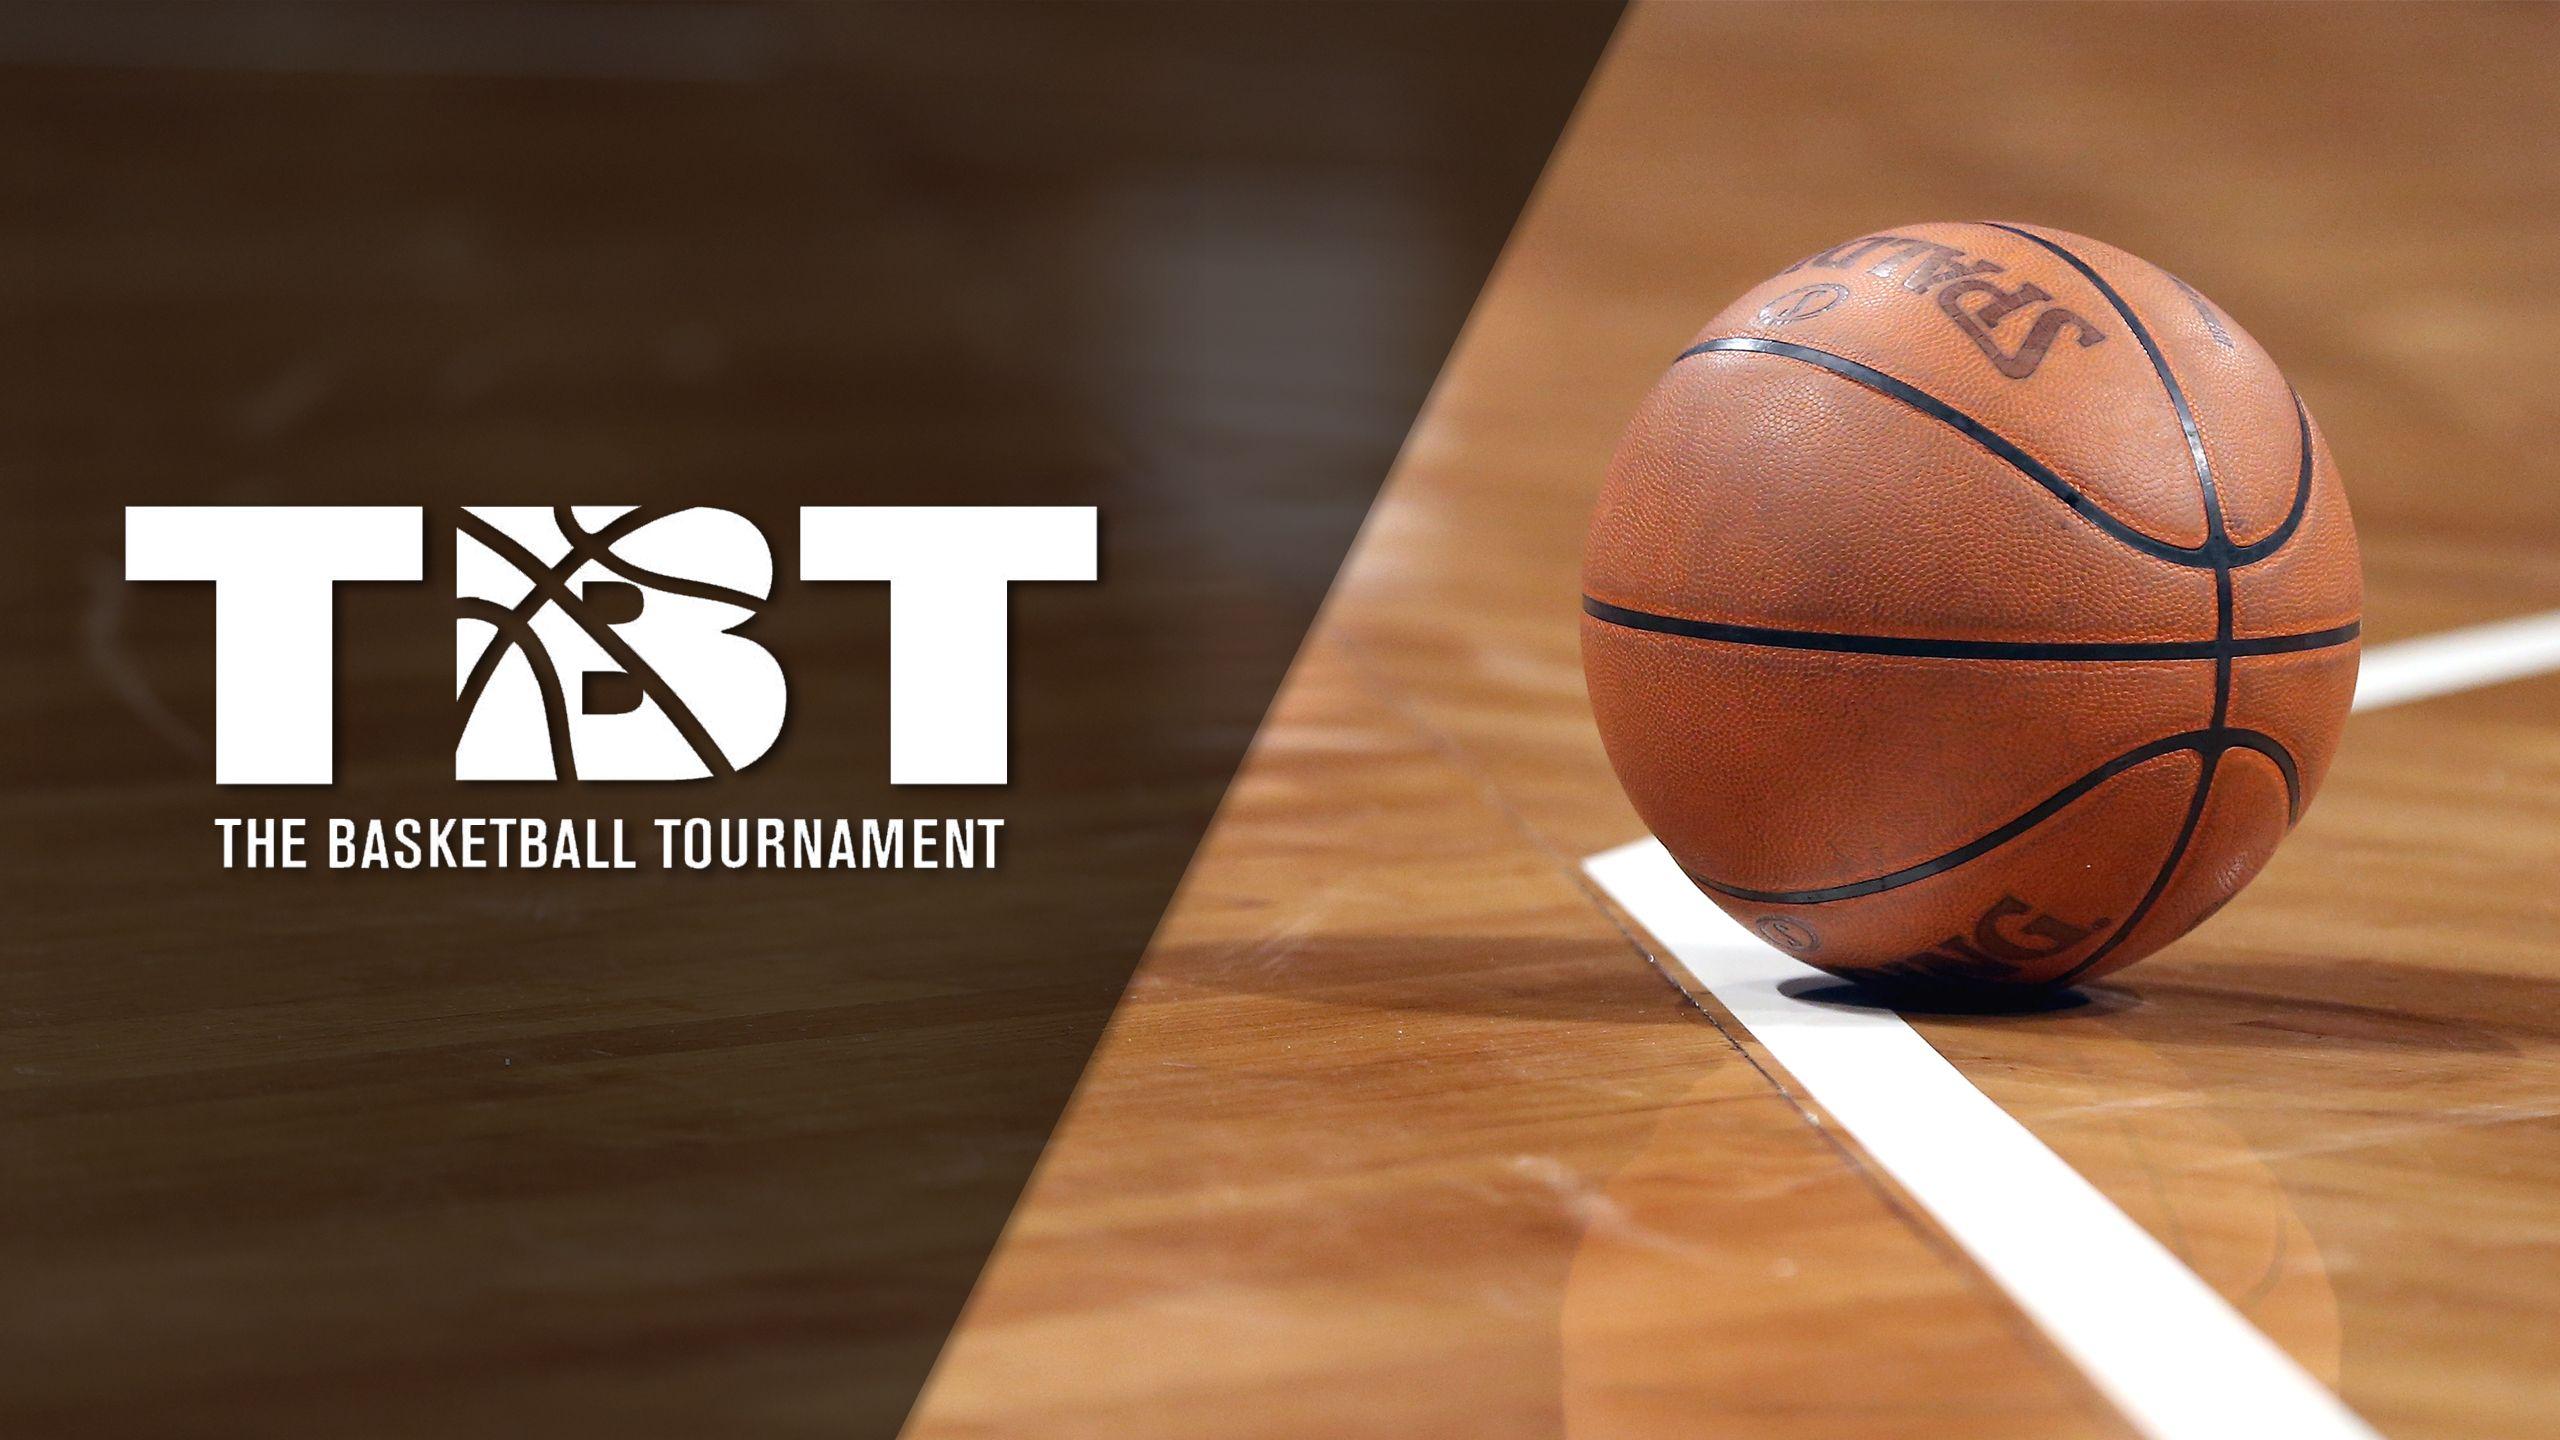 Matadors (Texas Tech Alumni) vs. Bearcat Jam (Cincinnati Alumni) (Regional Round) (TBT)